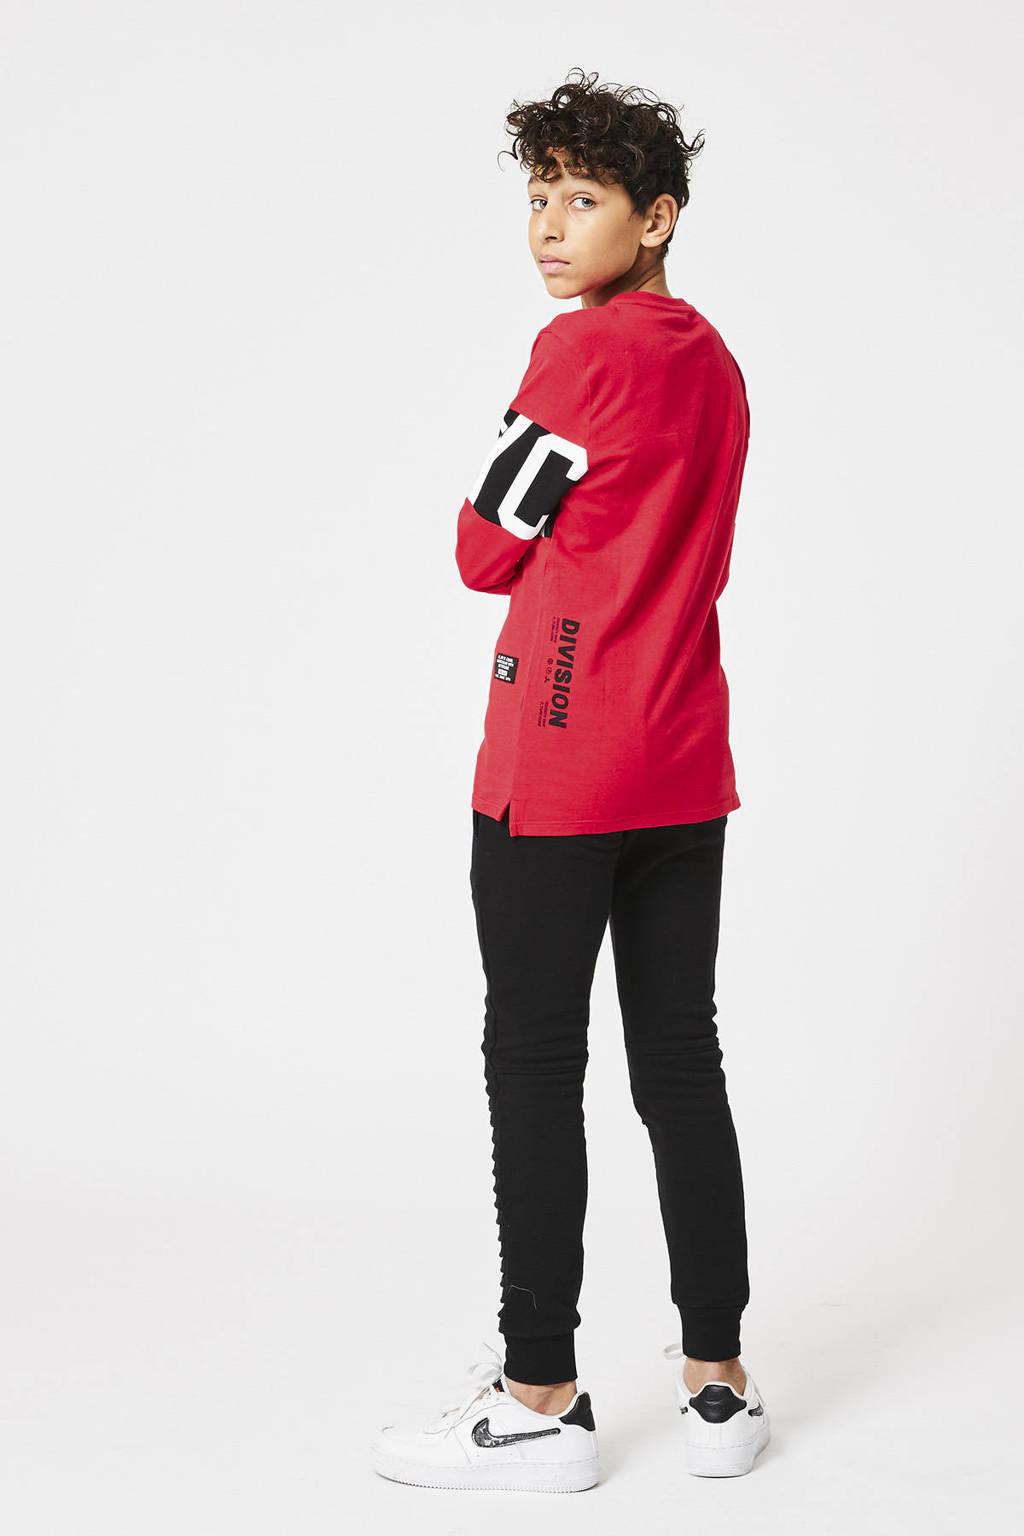 CoolCat Junior longsleeve Lesky met tekst rood/wit/zwart, Rood/wit/zwart